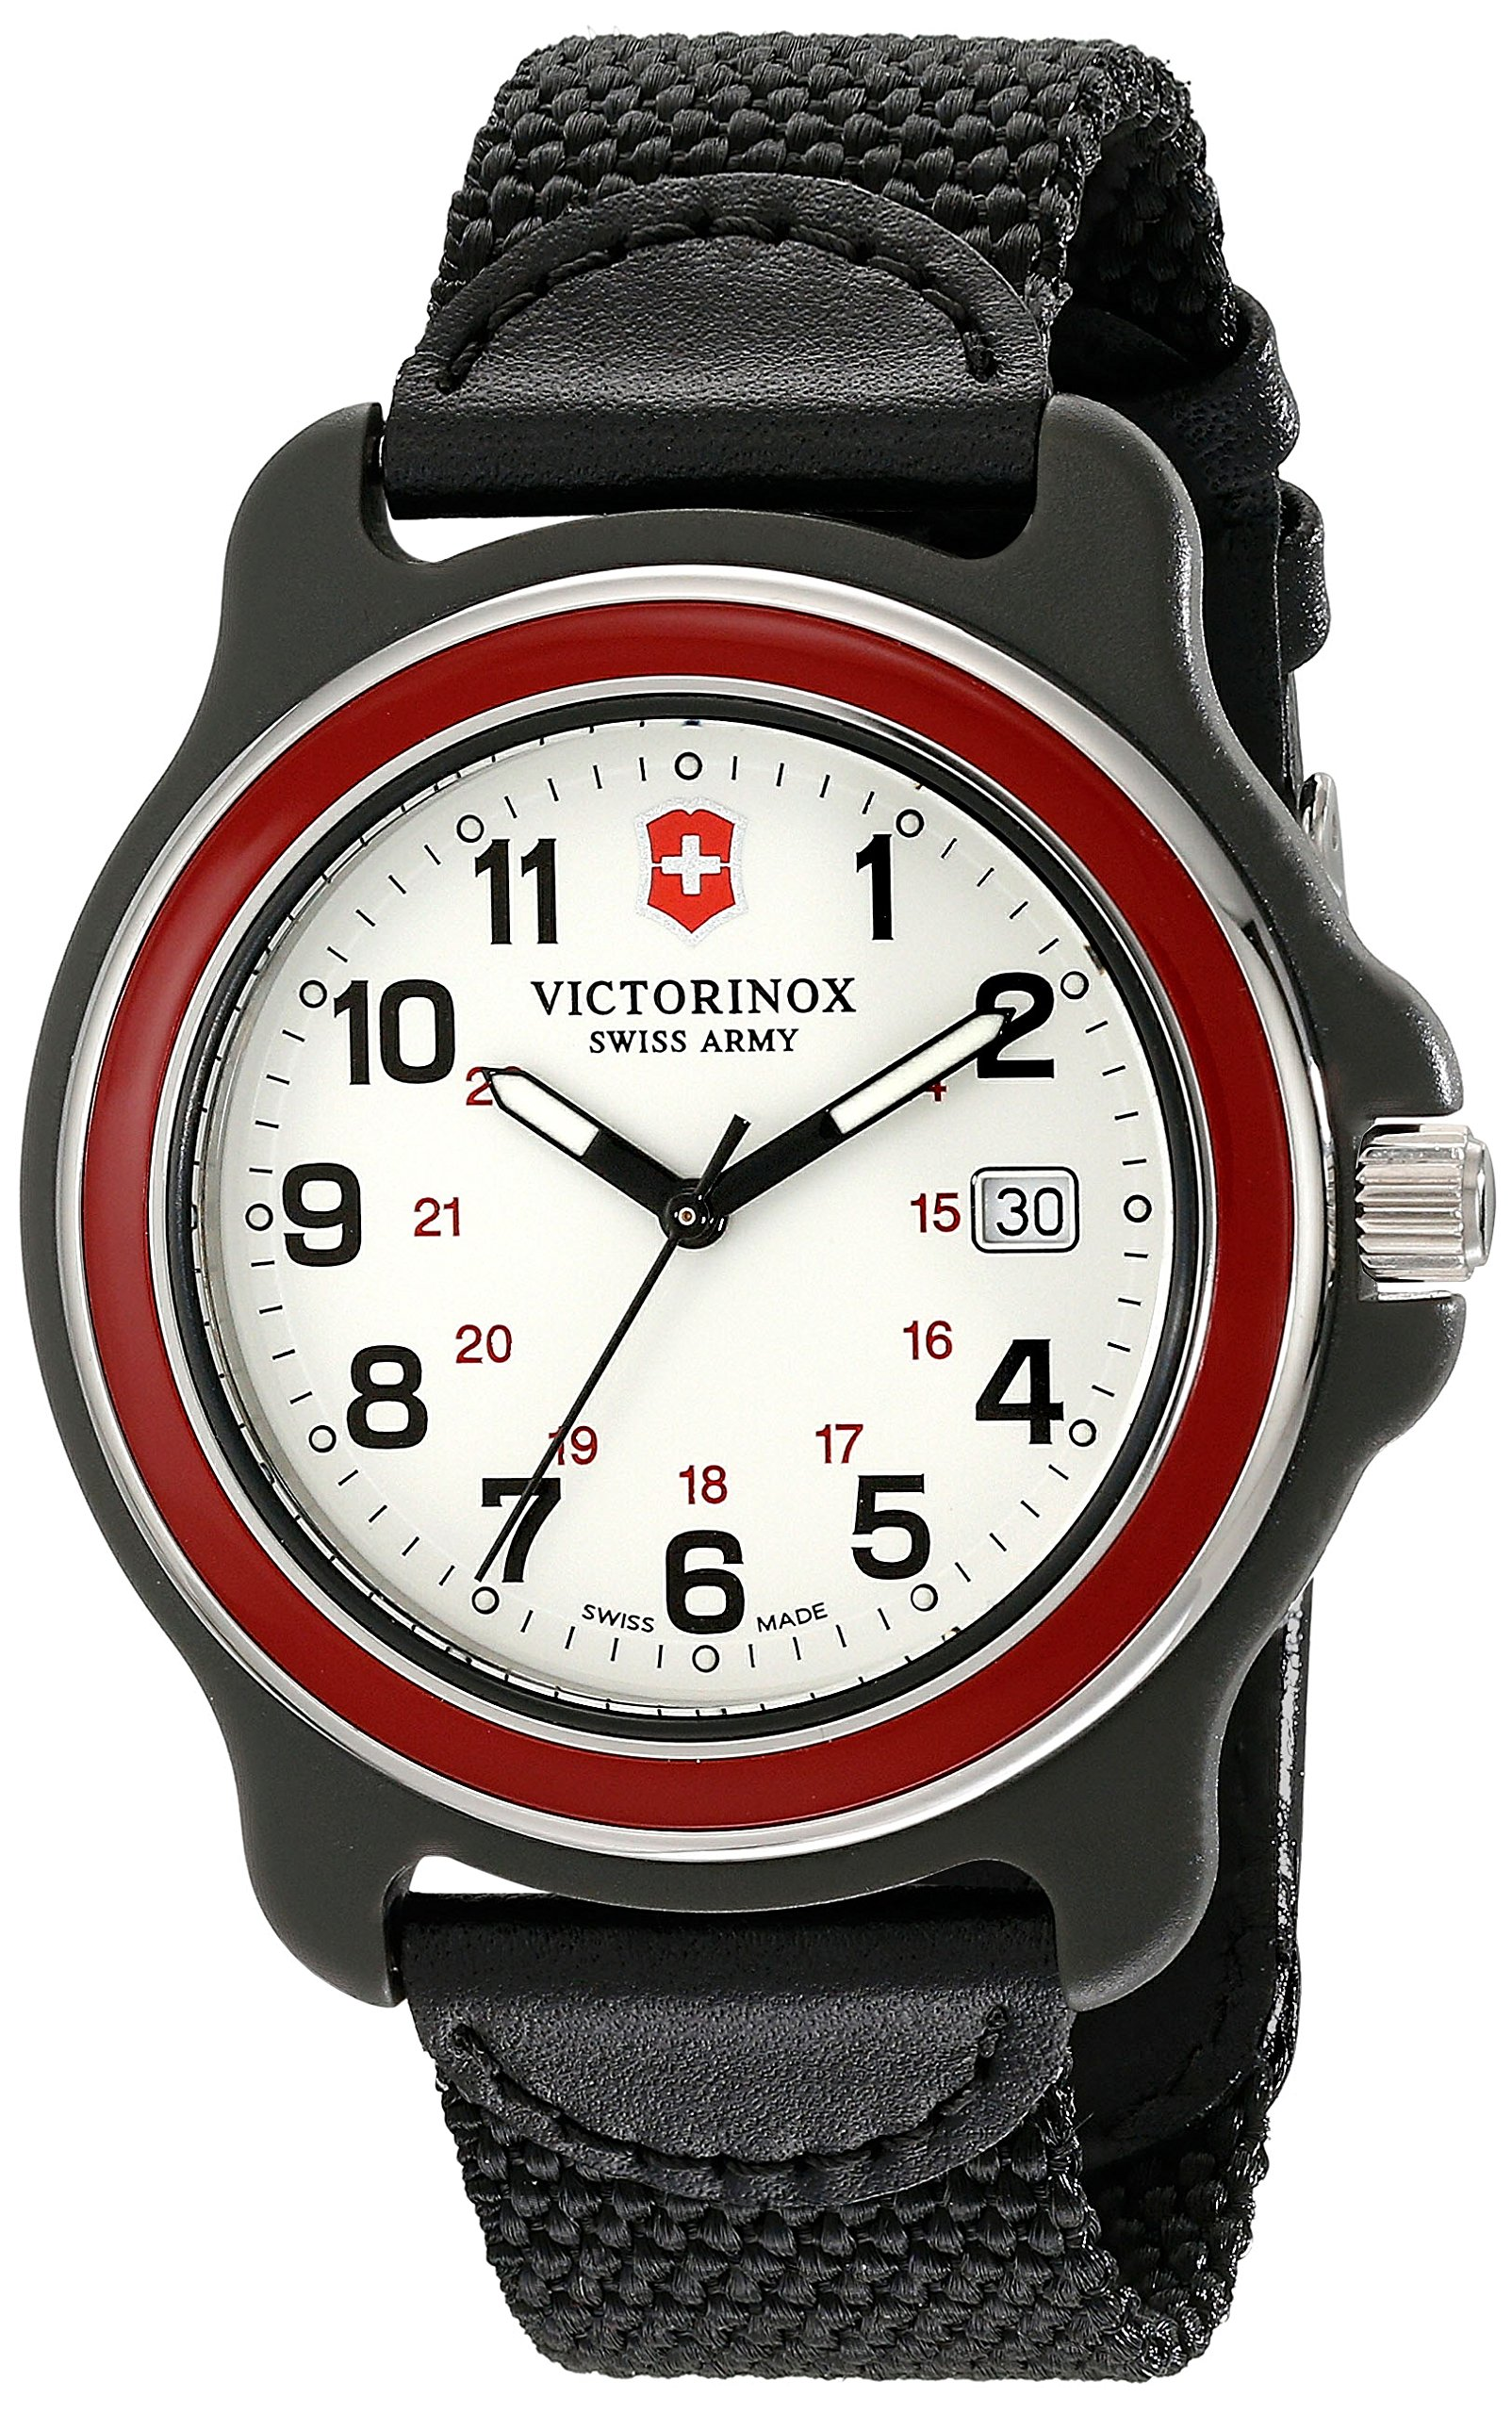 Victorinox Men's 249085 Original XL Swiss Quartz Watch With Black Nylon Band by Victorinox